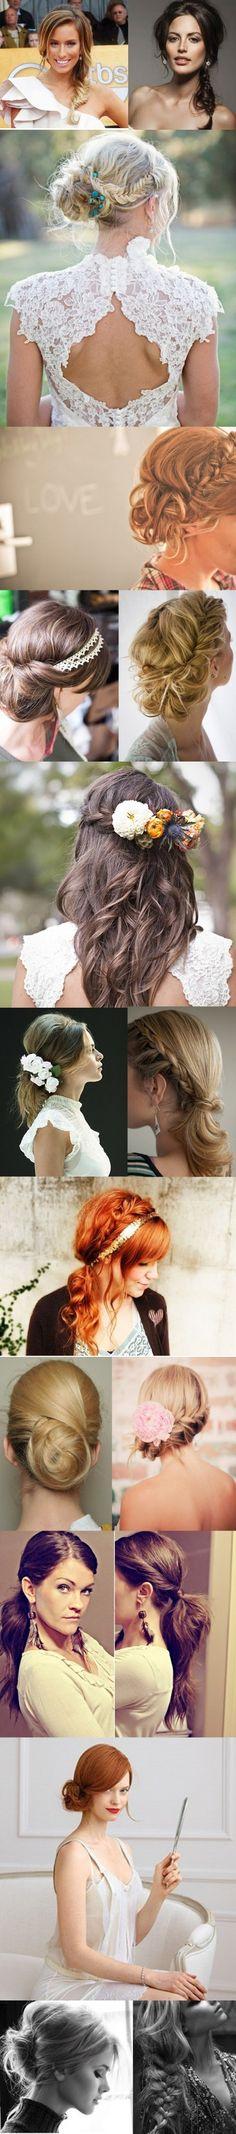 #formal #elegant #hair #updo #hairstyle #prom #wedding #fashion #trend #beauty #beautiful #pretty #prom #wedding #ideas